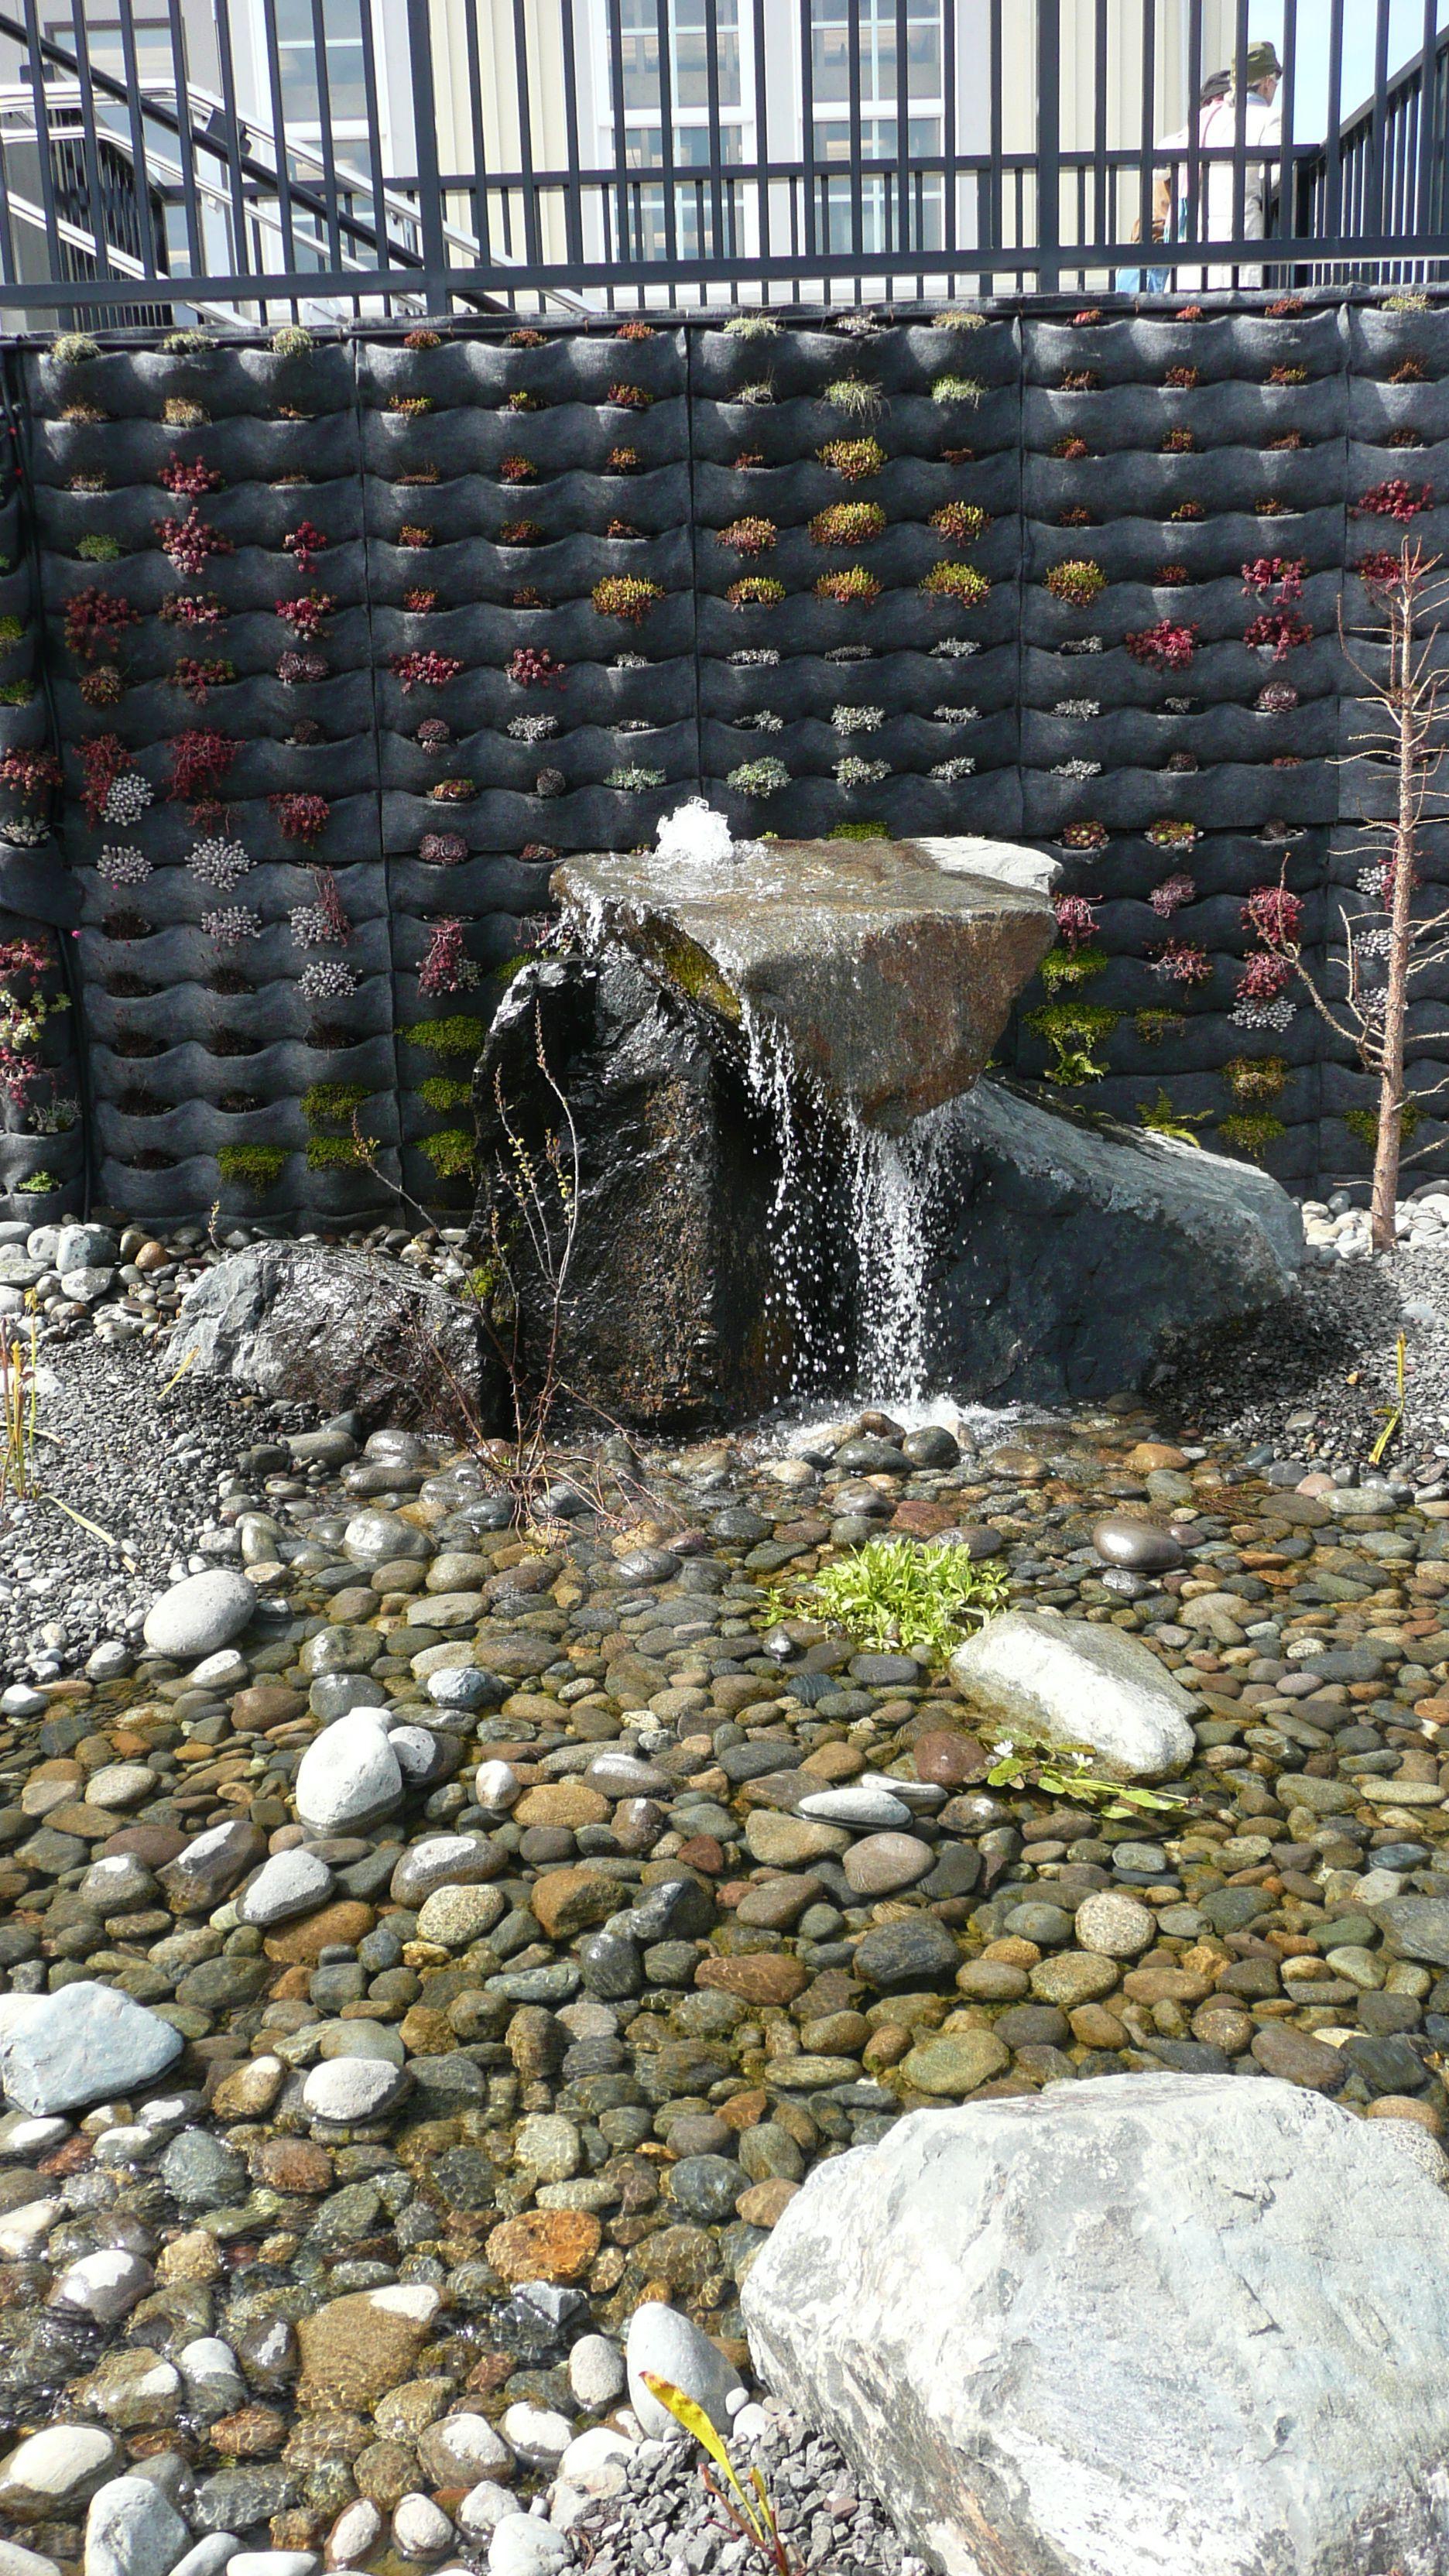 2012-04-15 Gig Harbor downtown waterfall by Ken Rury